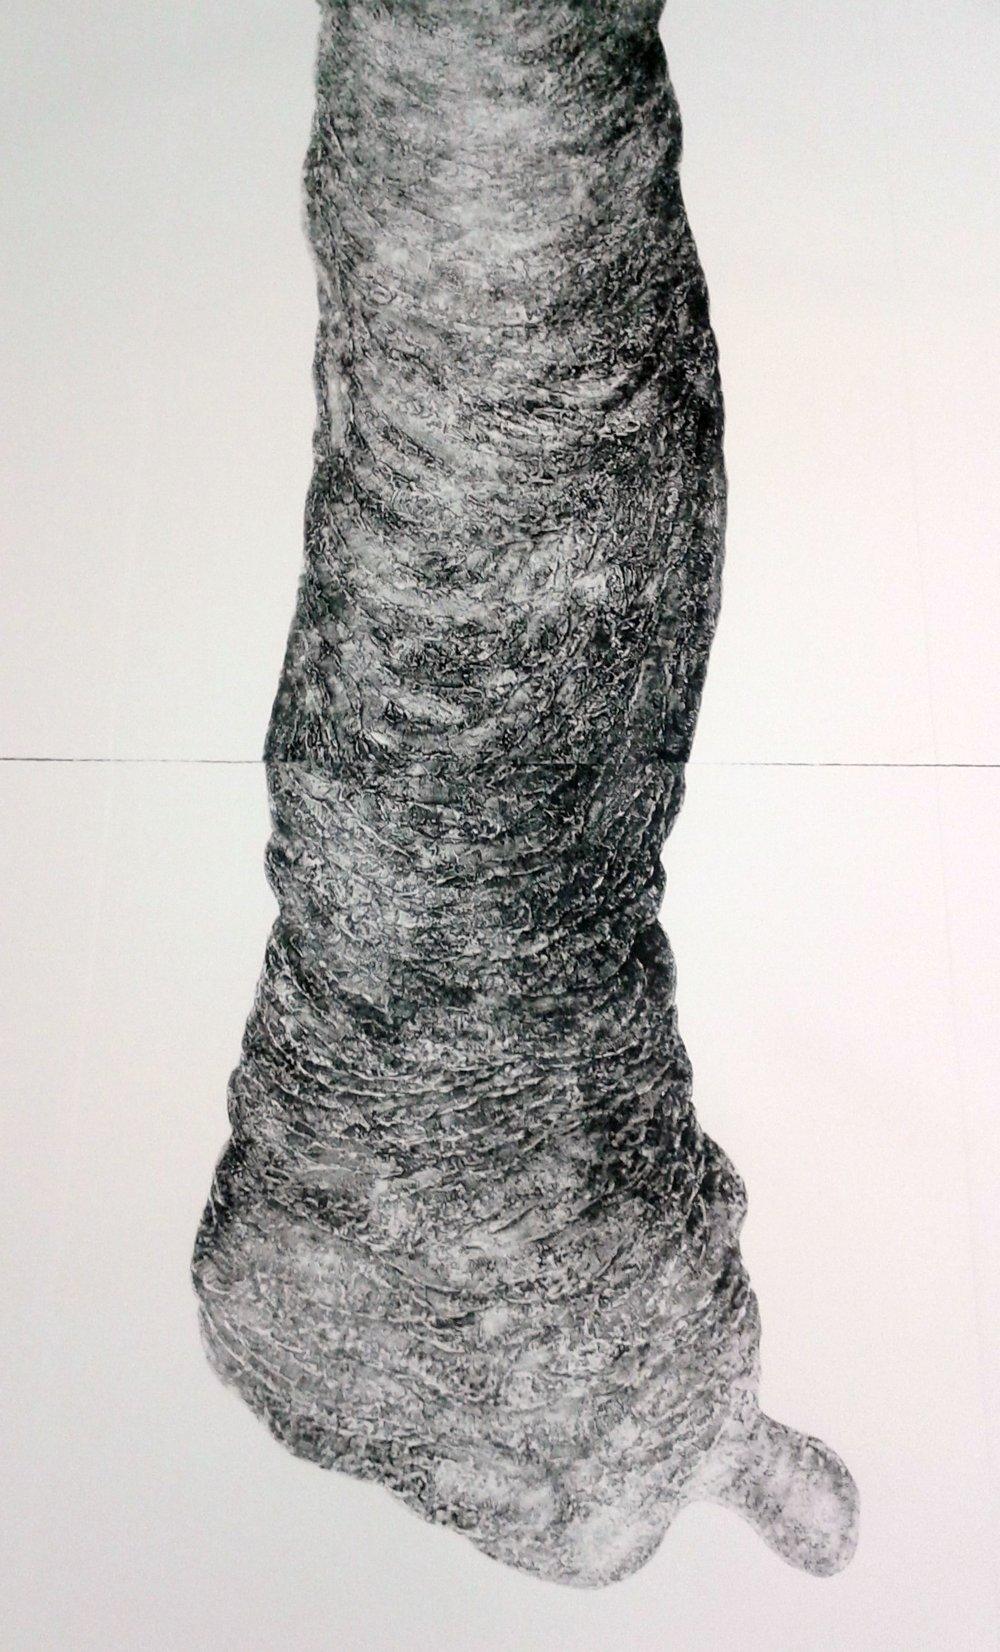 'Mater' Collagraph print. Detail. 60x118cms. 2017.